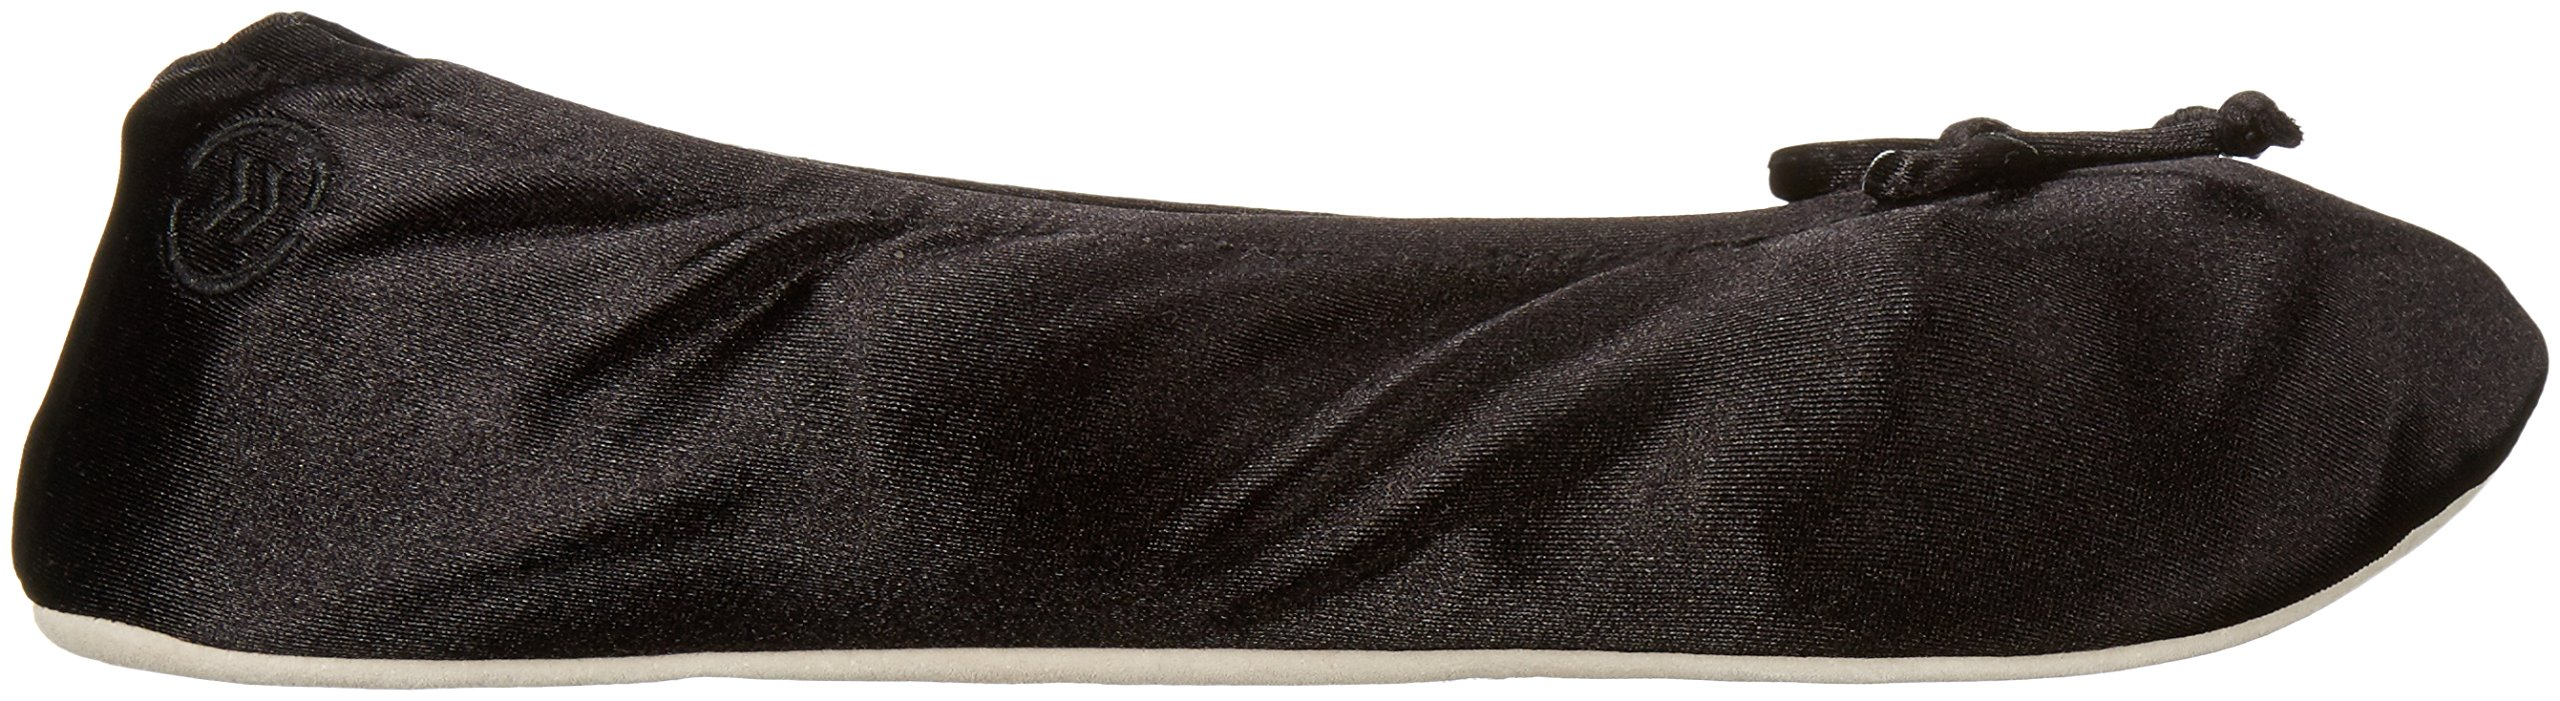 ISOTONER Women's Satin Ballerina Slipper, Black, Large/8-9 M US by ISOTONER (Image #9)